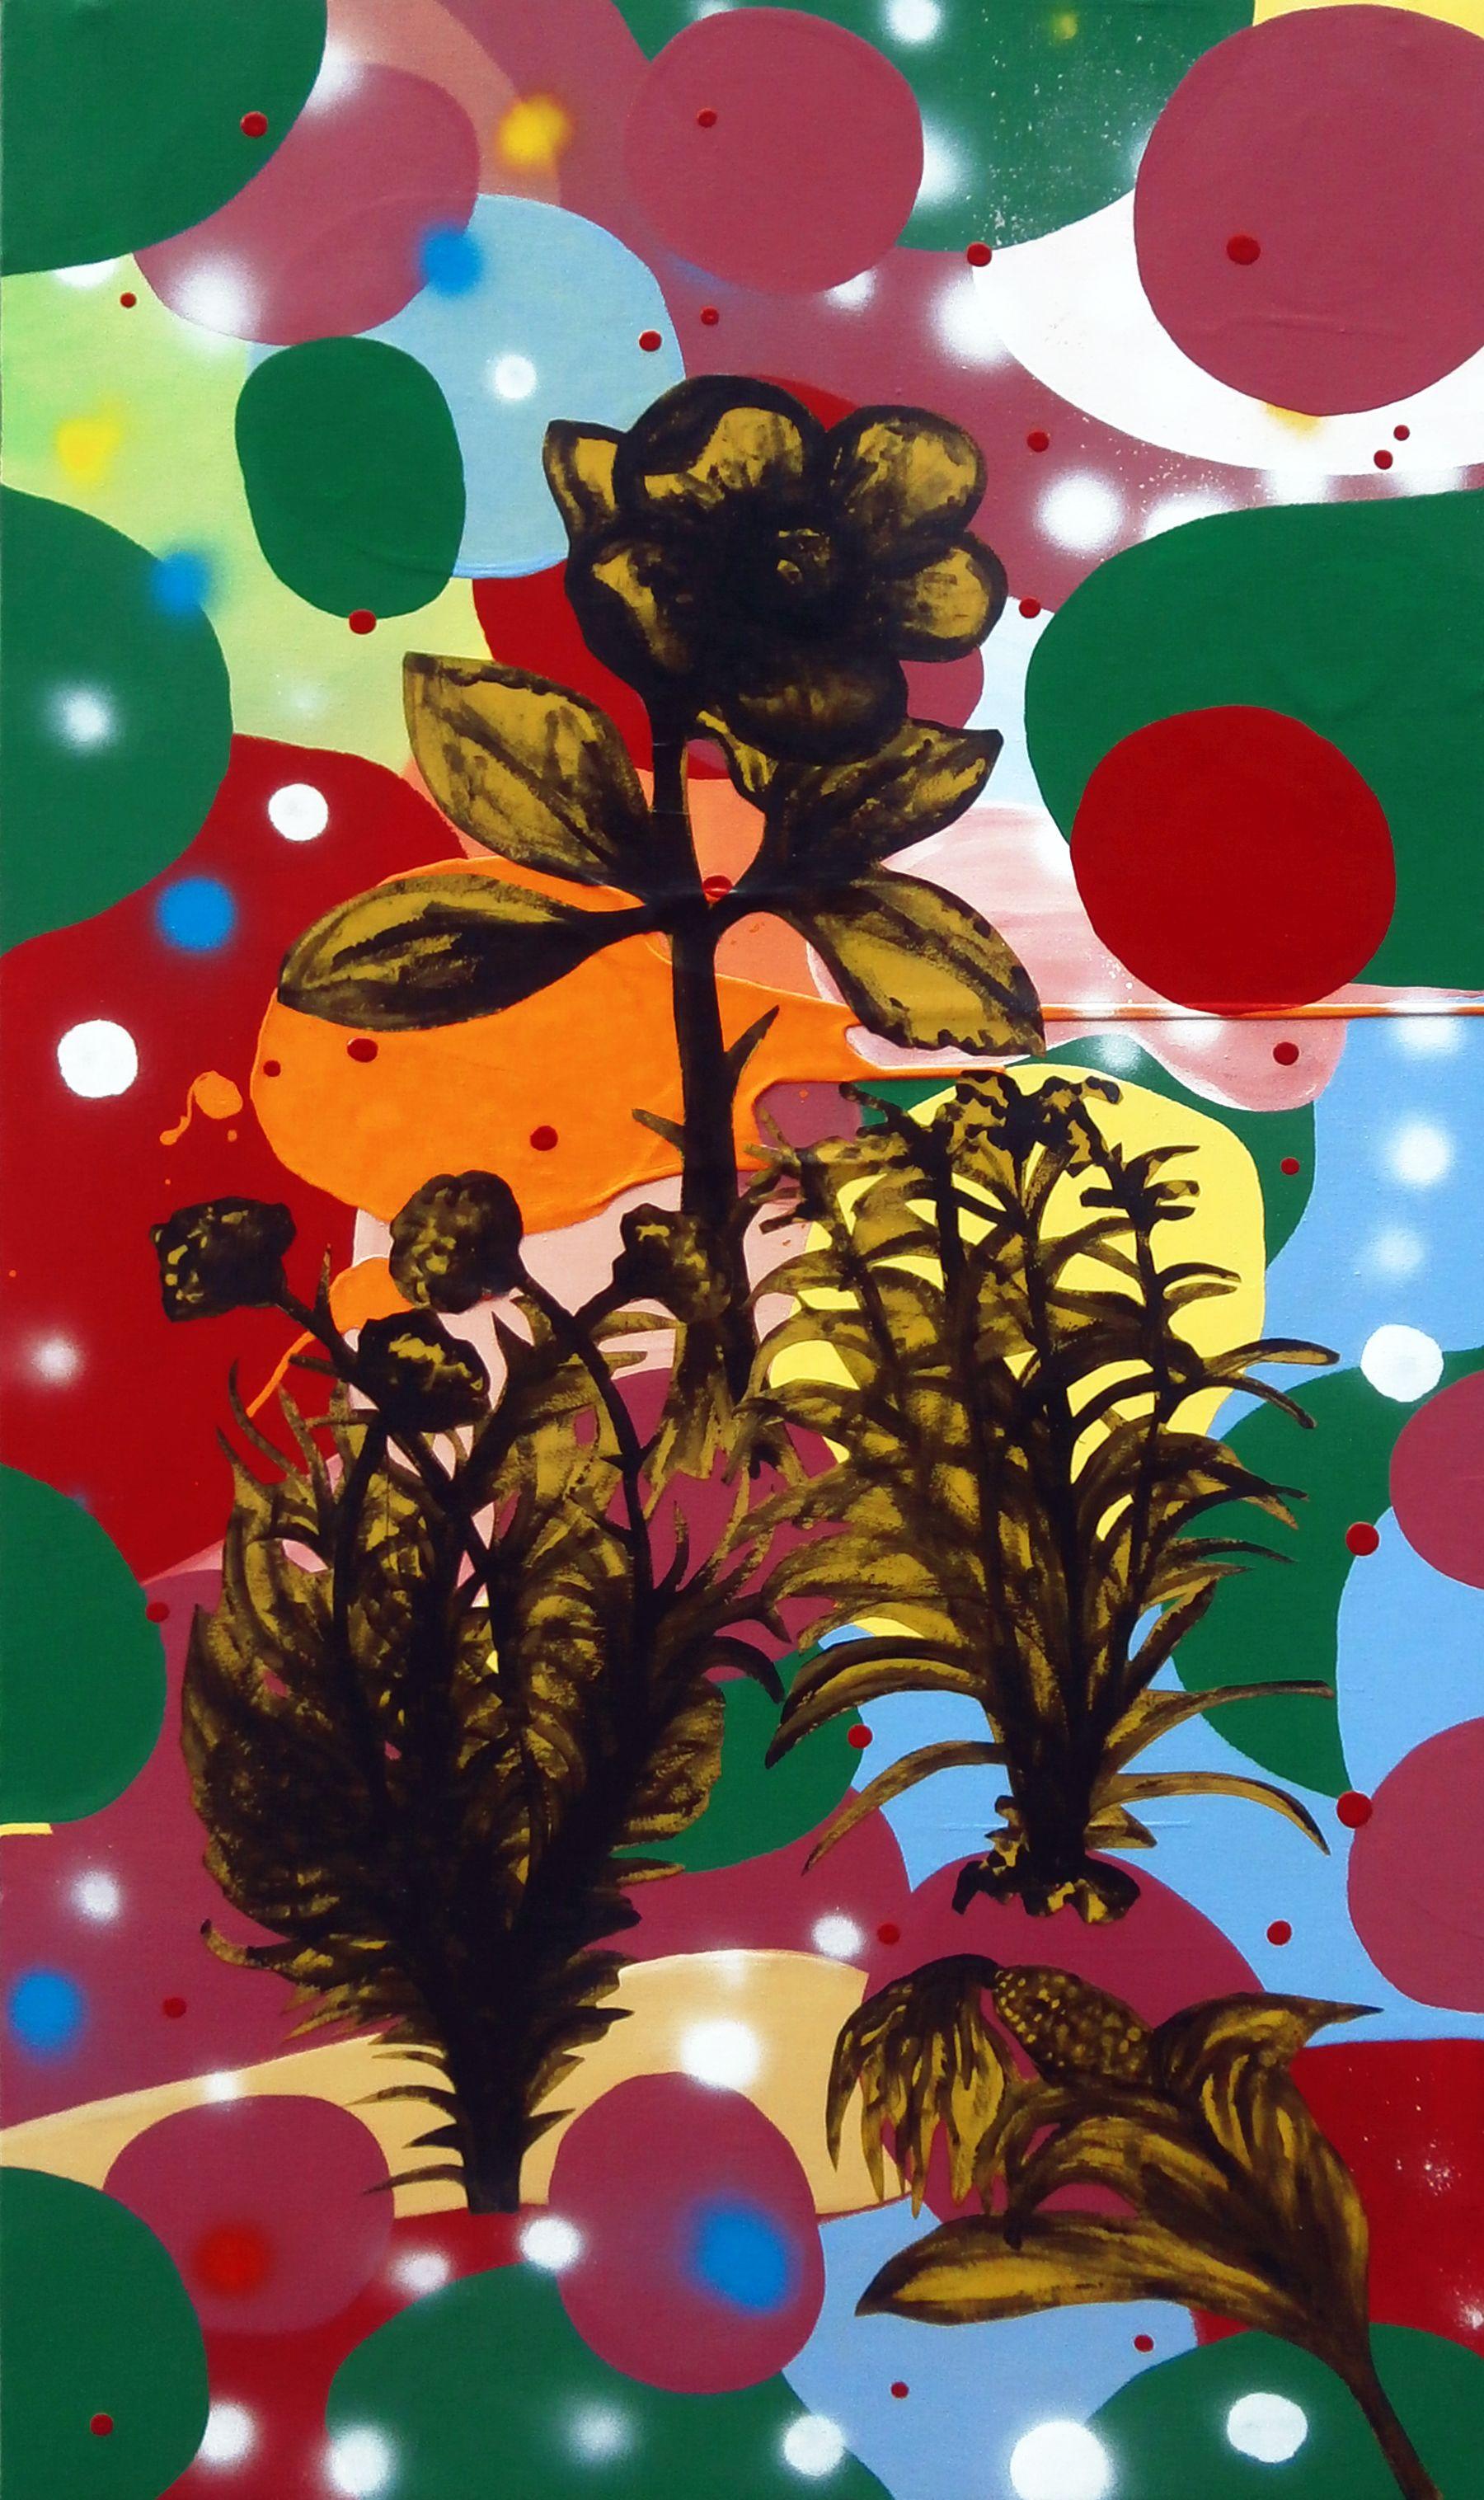 Michael Rotondi, Still life, 2015, tecnica mista su tela, 110x66 cm